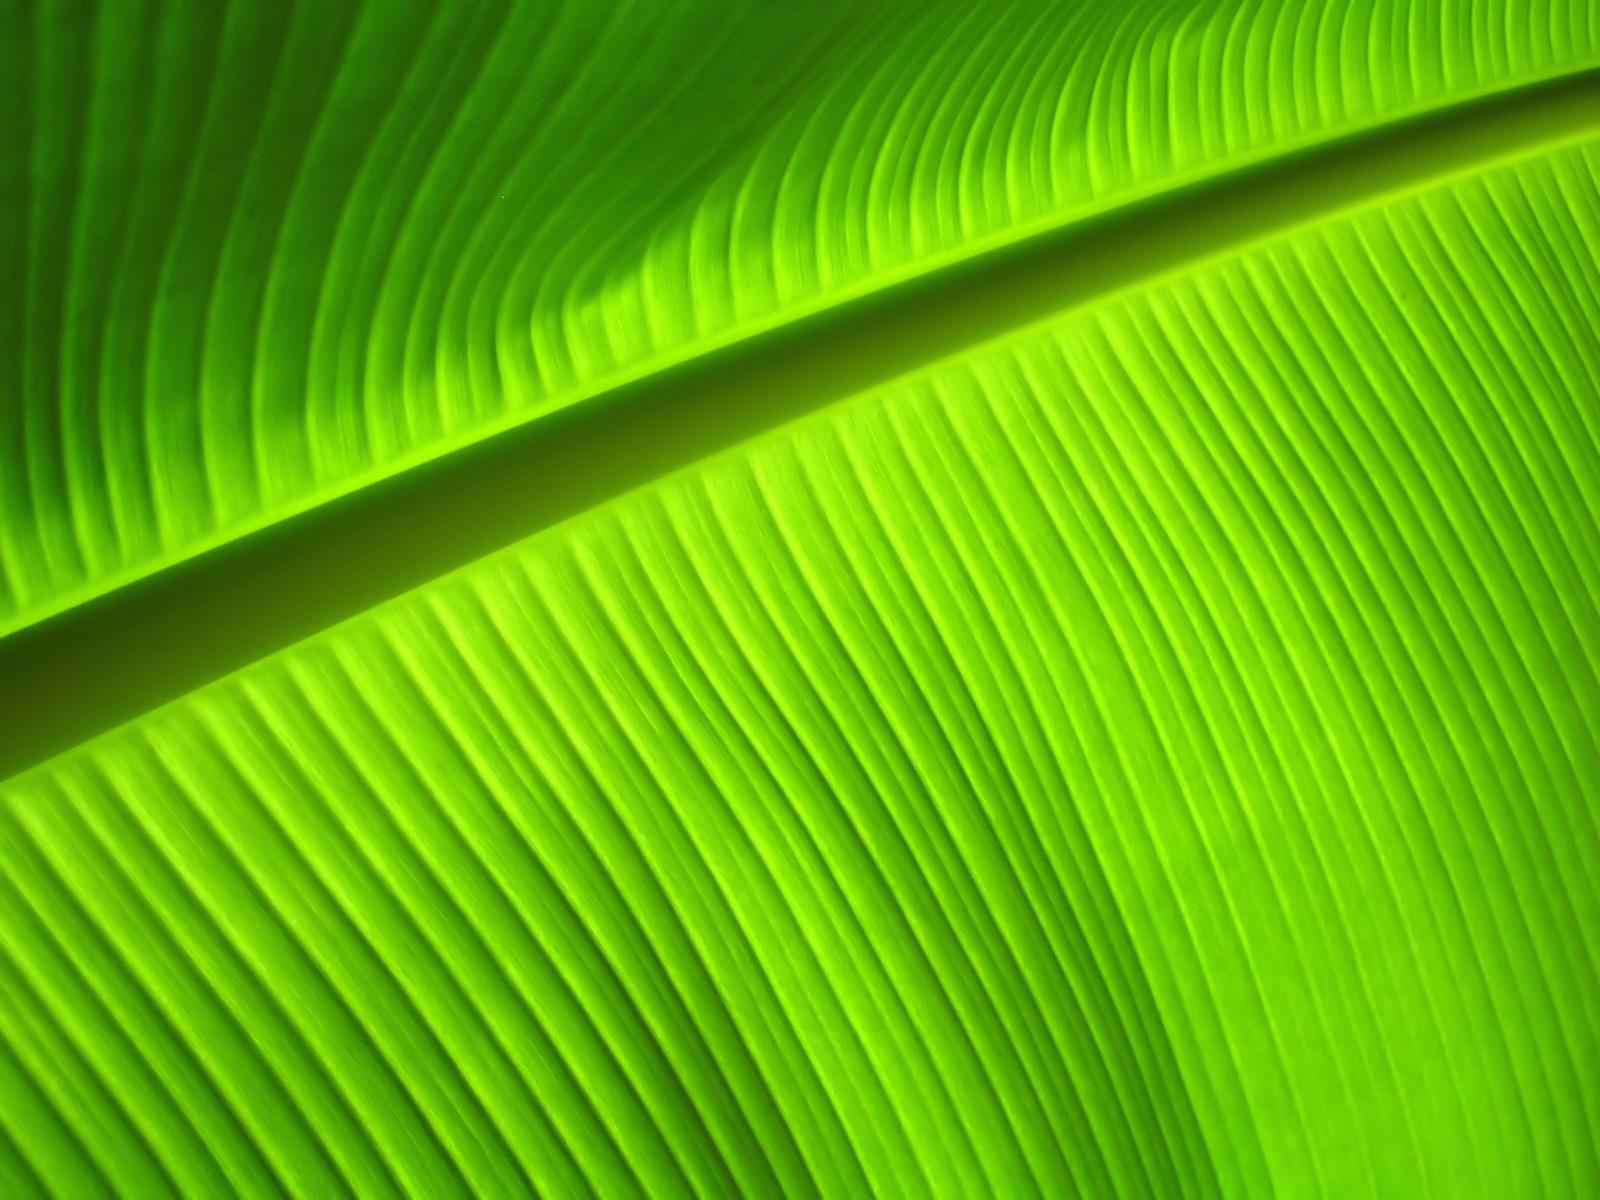 download Banana Leaf Close Up wallpaper 1600x1200